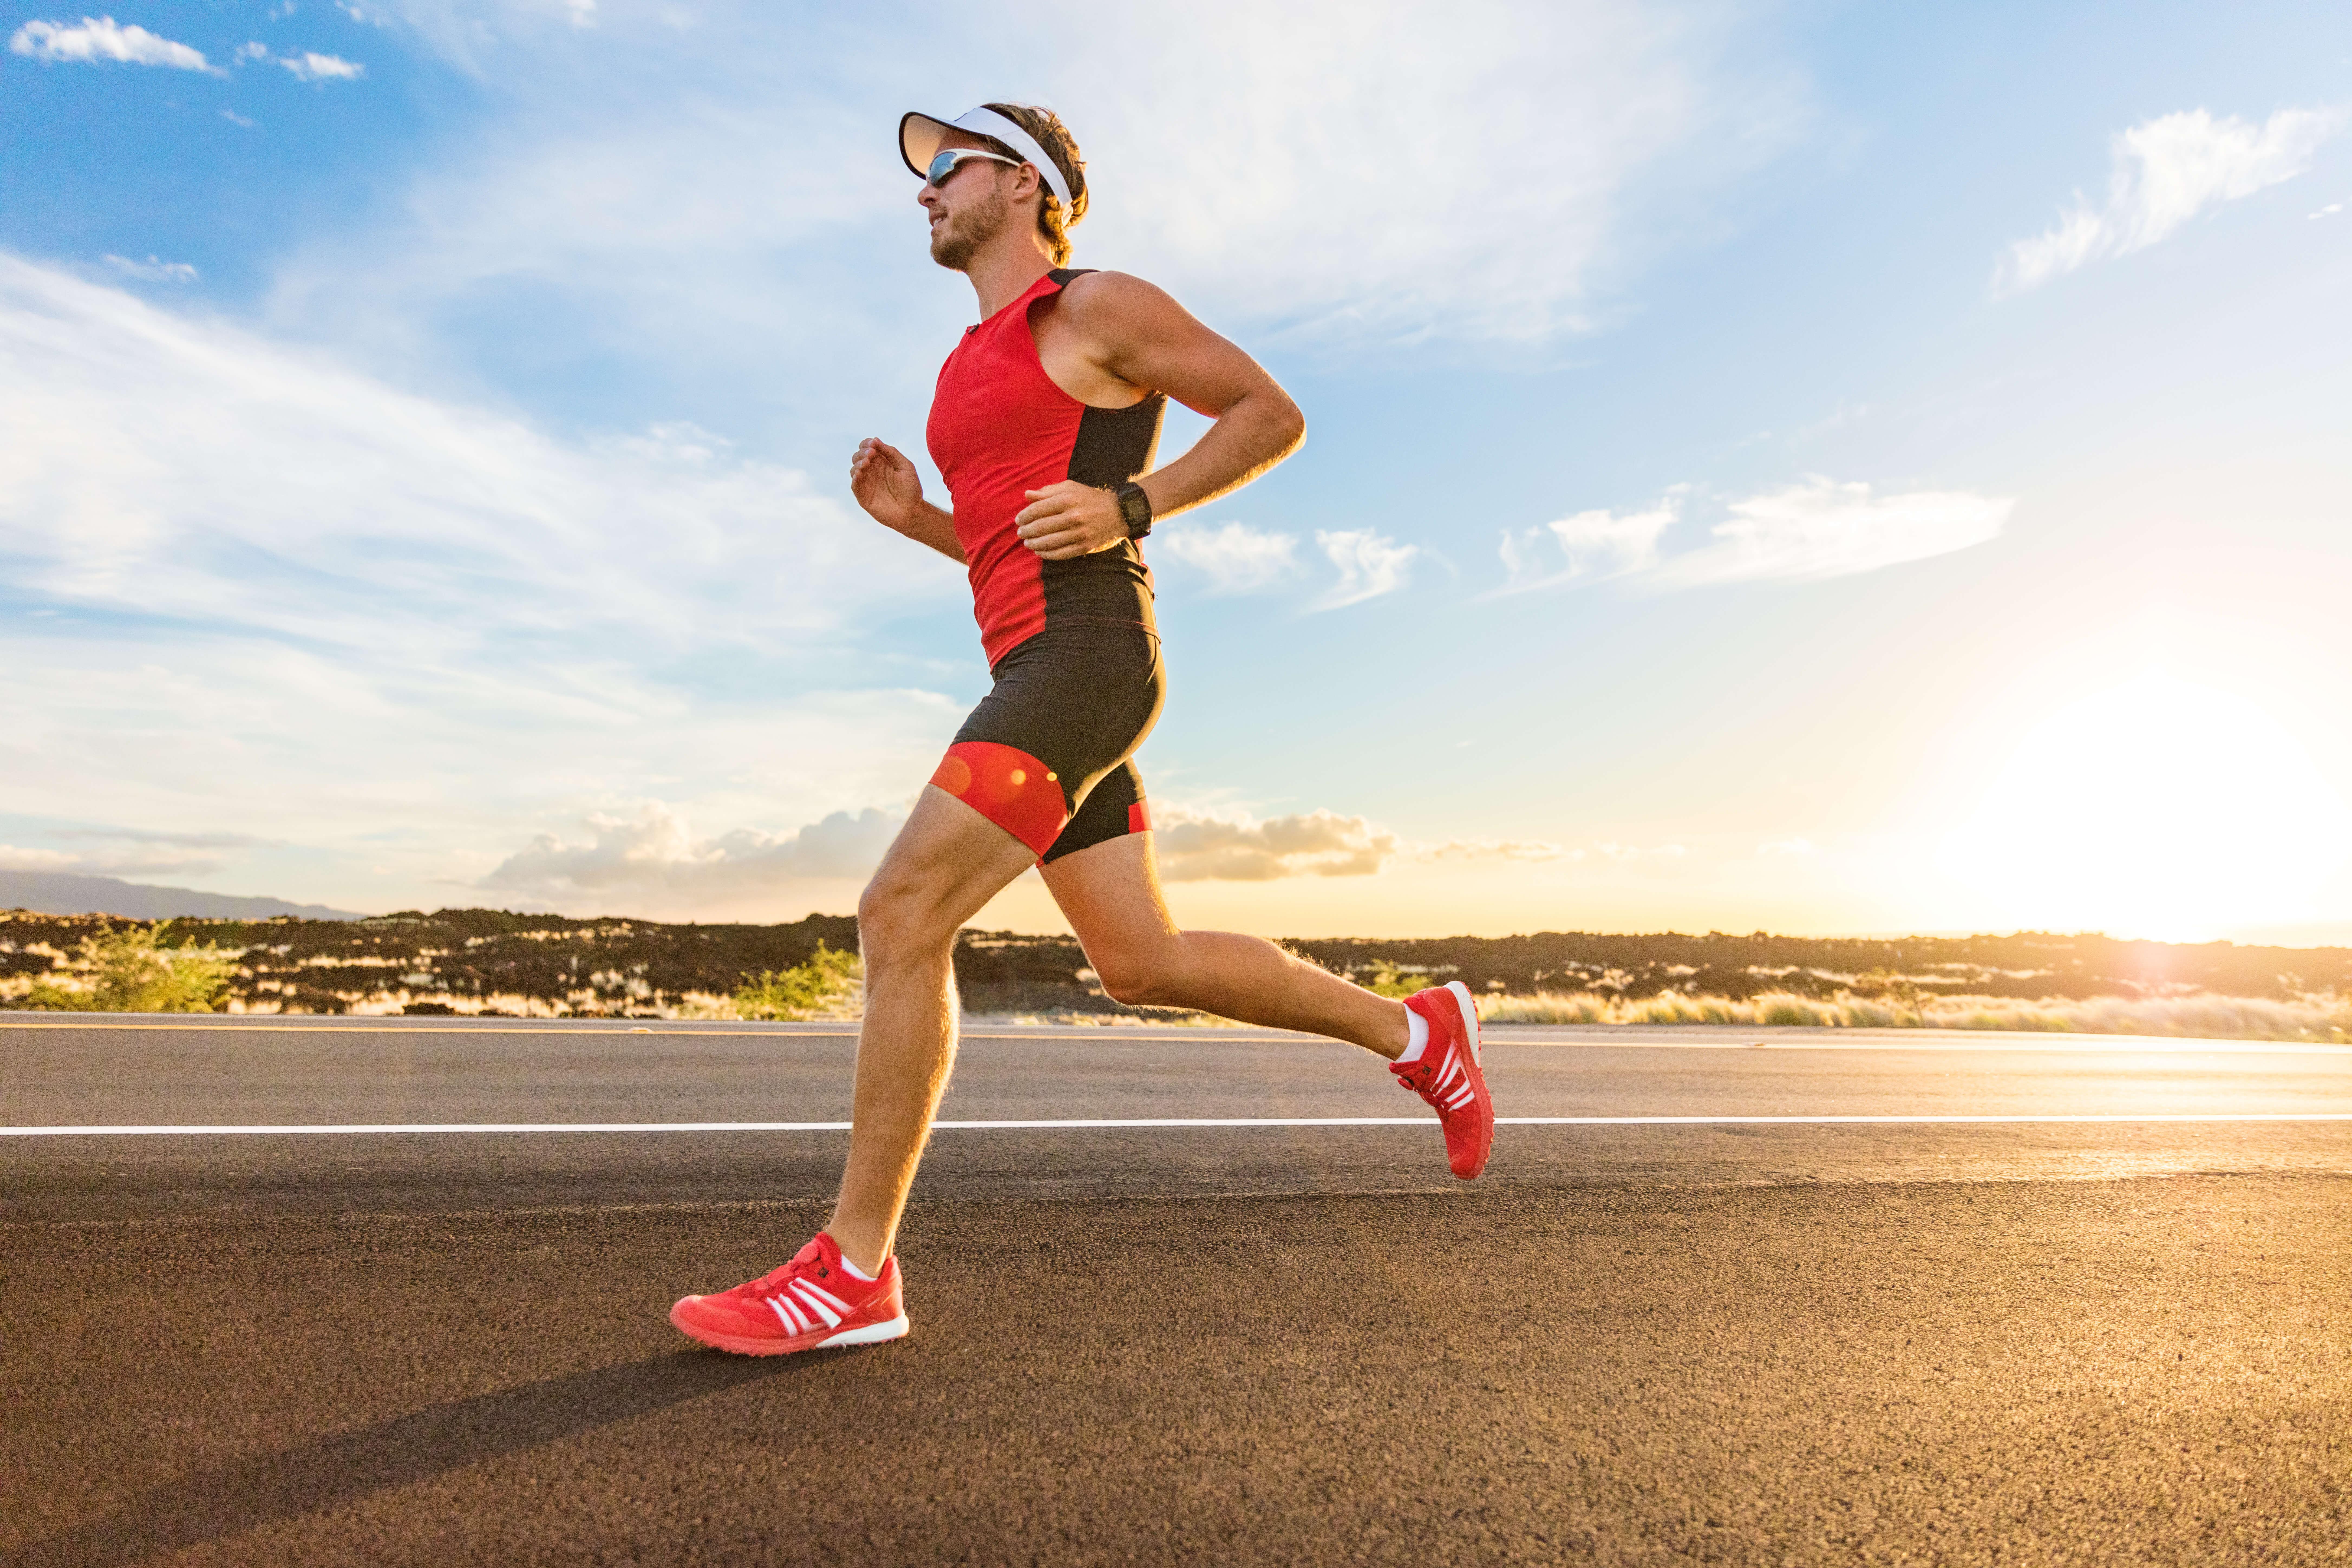 Physical therapy triathlon training Battle Creek, Kalamazoo, Mattawan, Plainwell & Portage, MI